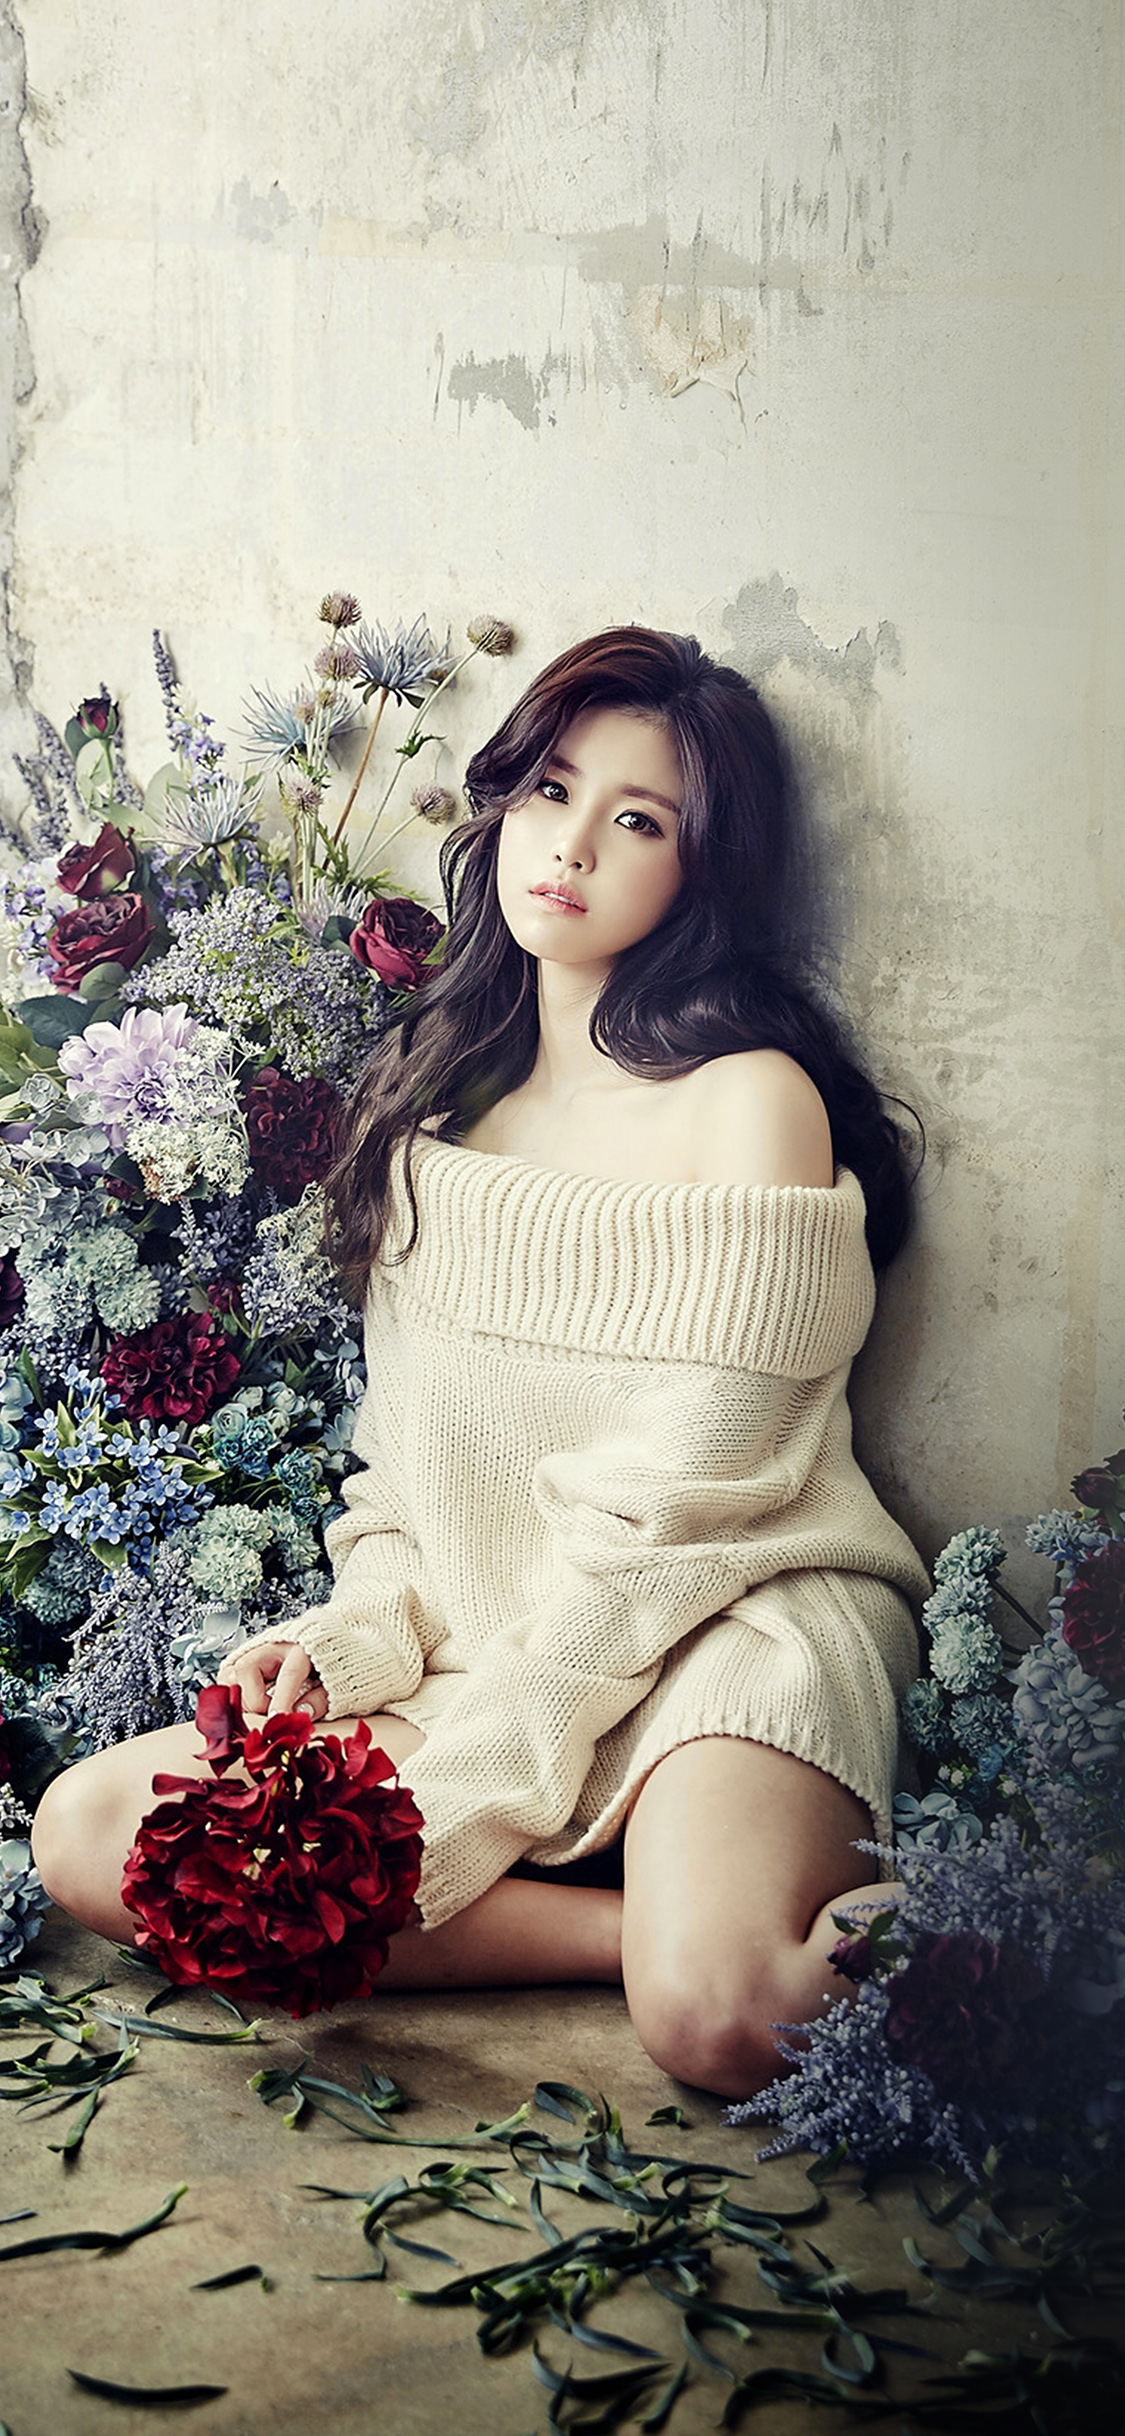 iPhoneXpapers.com-Apple-iPhone-wallpaper-hl29-flower-girl-hyosung-girl-kpop-celebrity